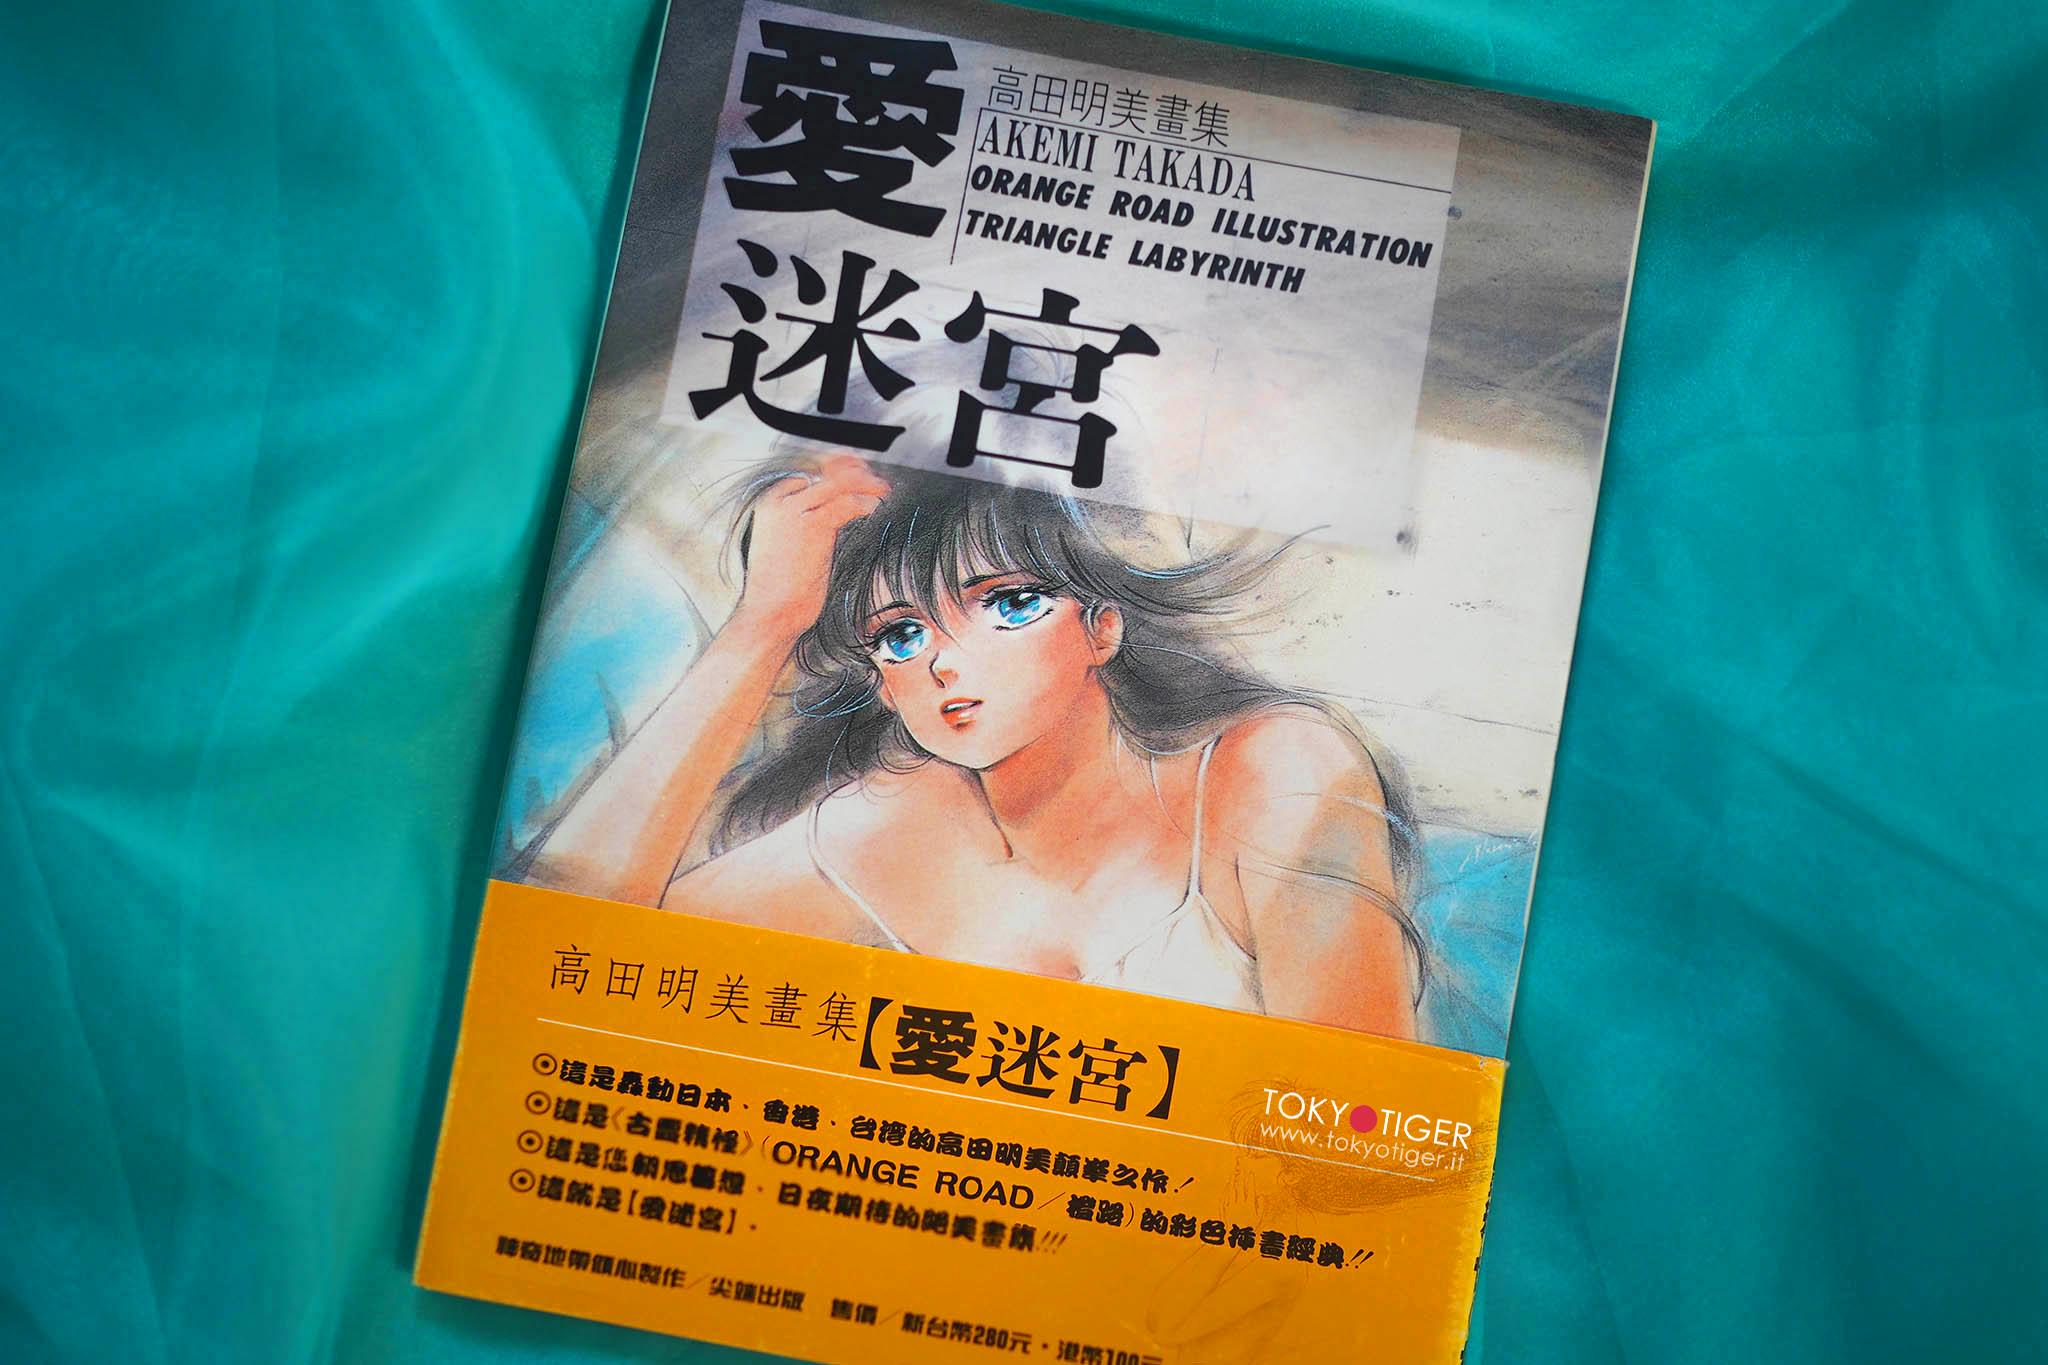 Creamy-anime-comics,creamy-artbook,Kimagure-orange-road,creamy-mami,tokyotiger,lady-oscar,versailles-no-bara,akemi-takada,triangle-labyrinth,